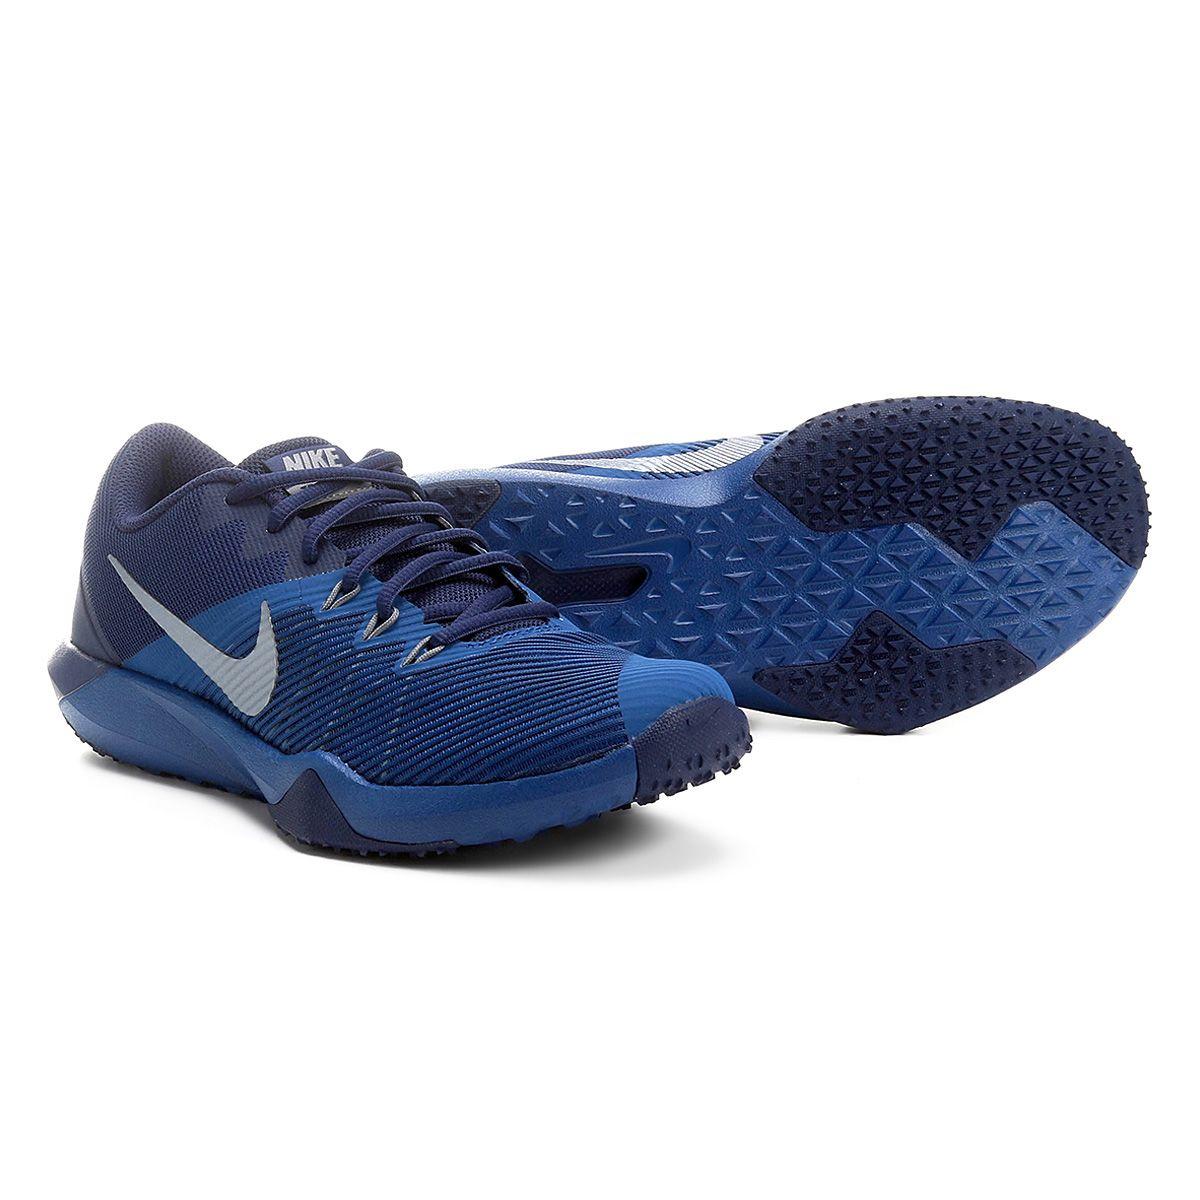 e1390dc17f8 Tênis Nike Retaliation TR Masculino Azul e Cinza